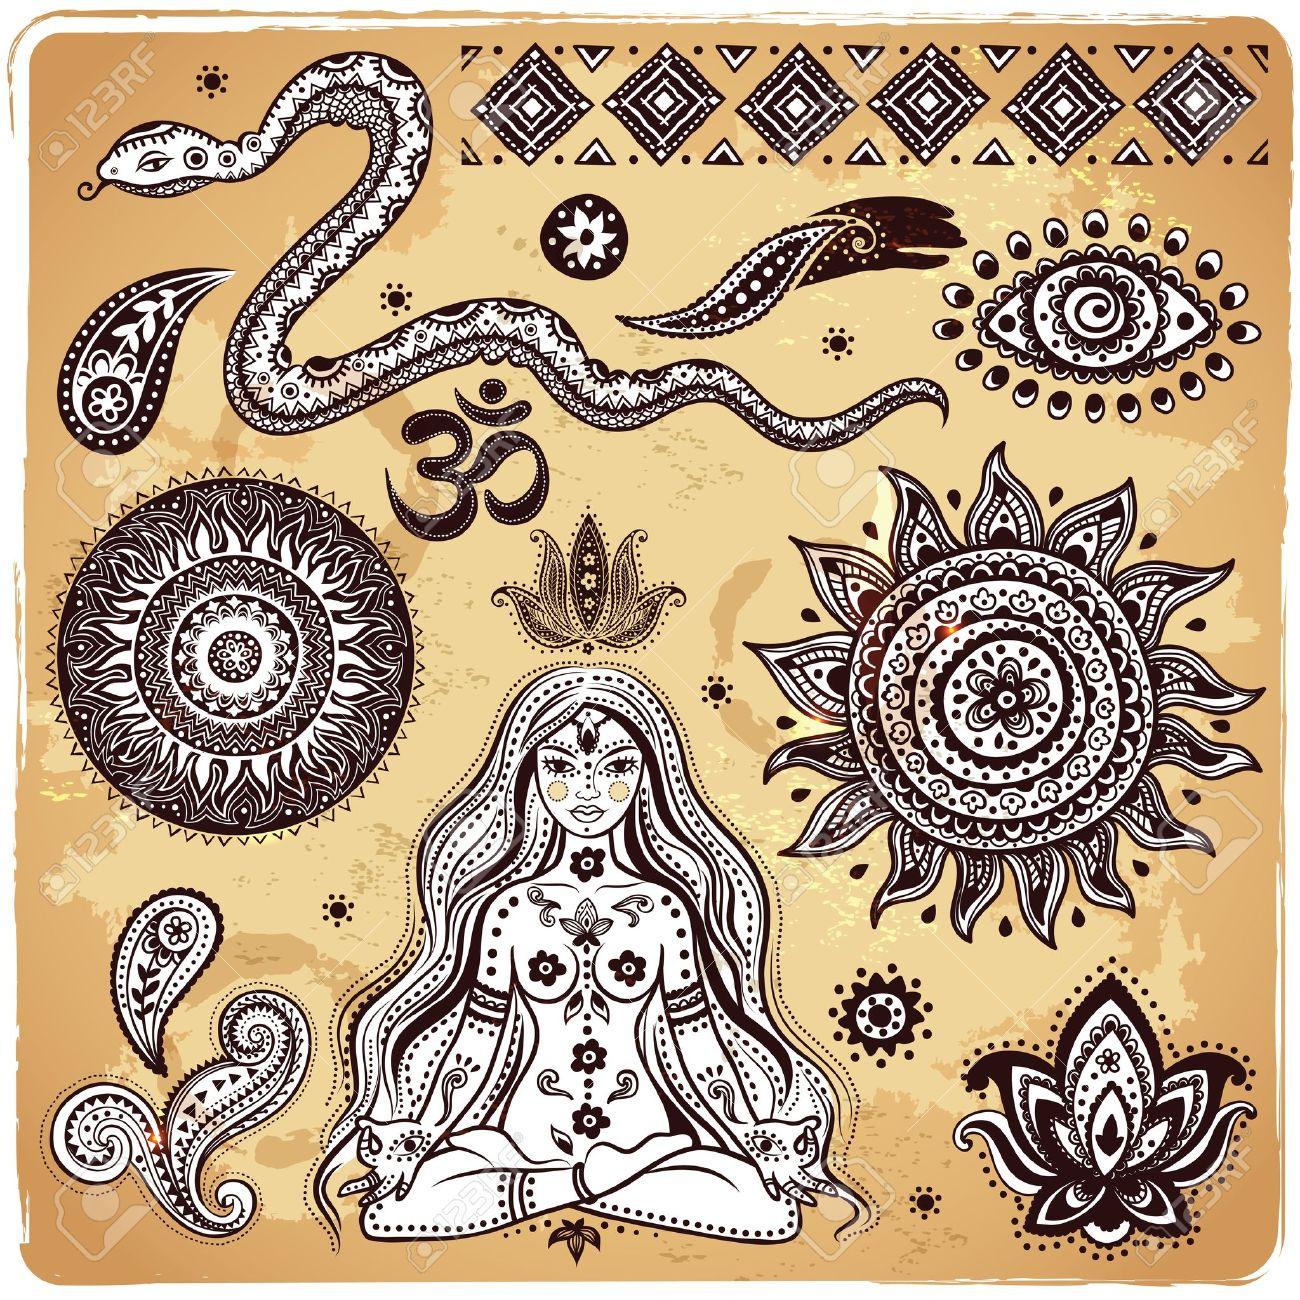 Set of ornamental Indian elements and symbols Stock Vector - 19800513